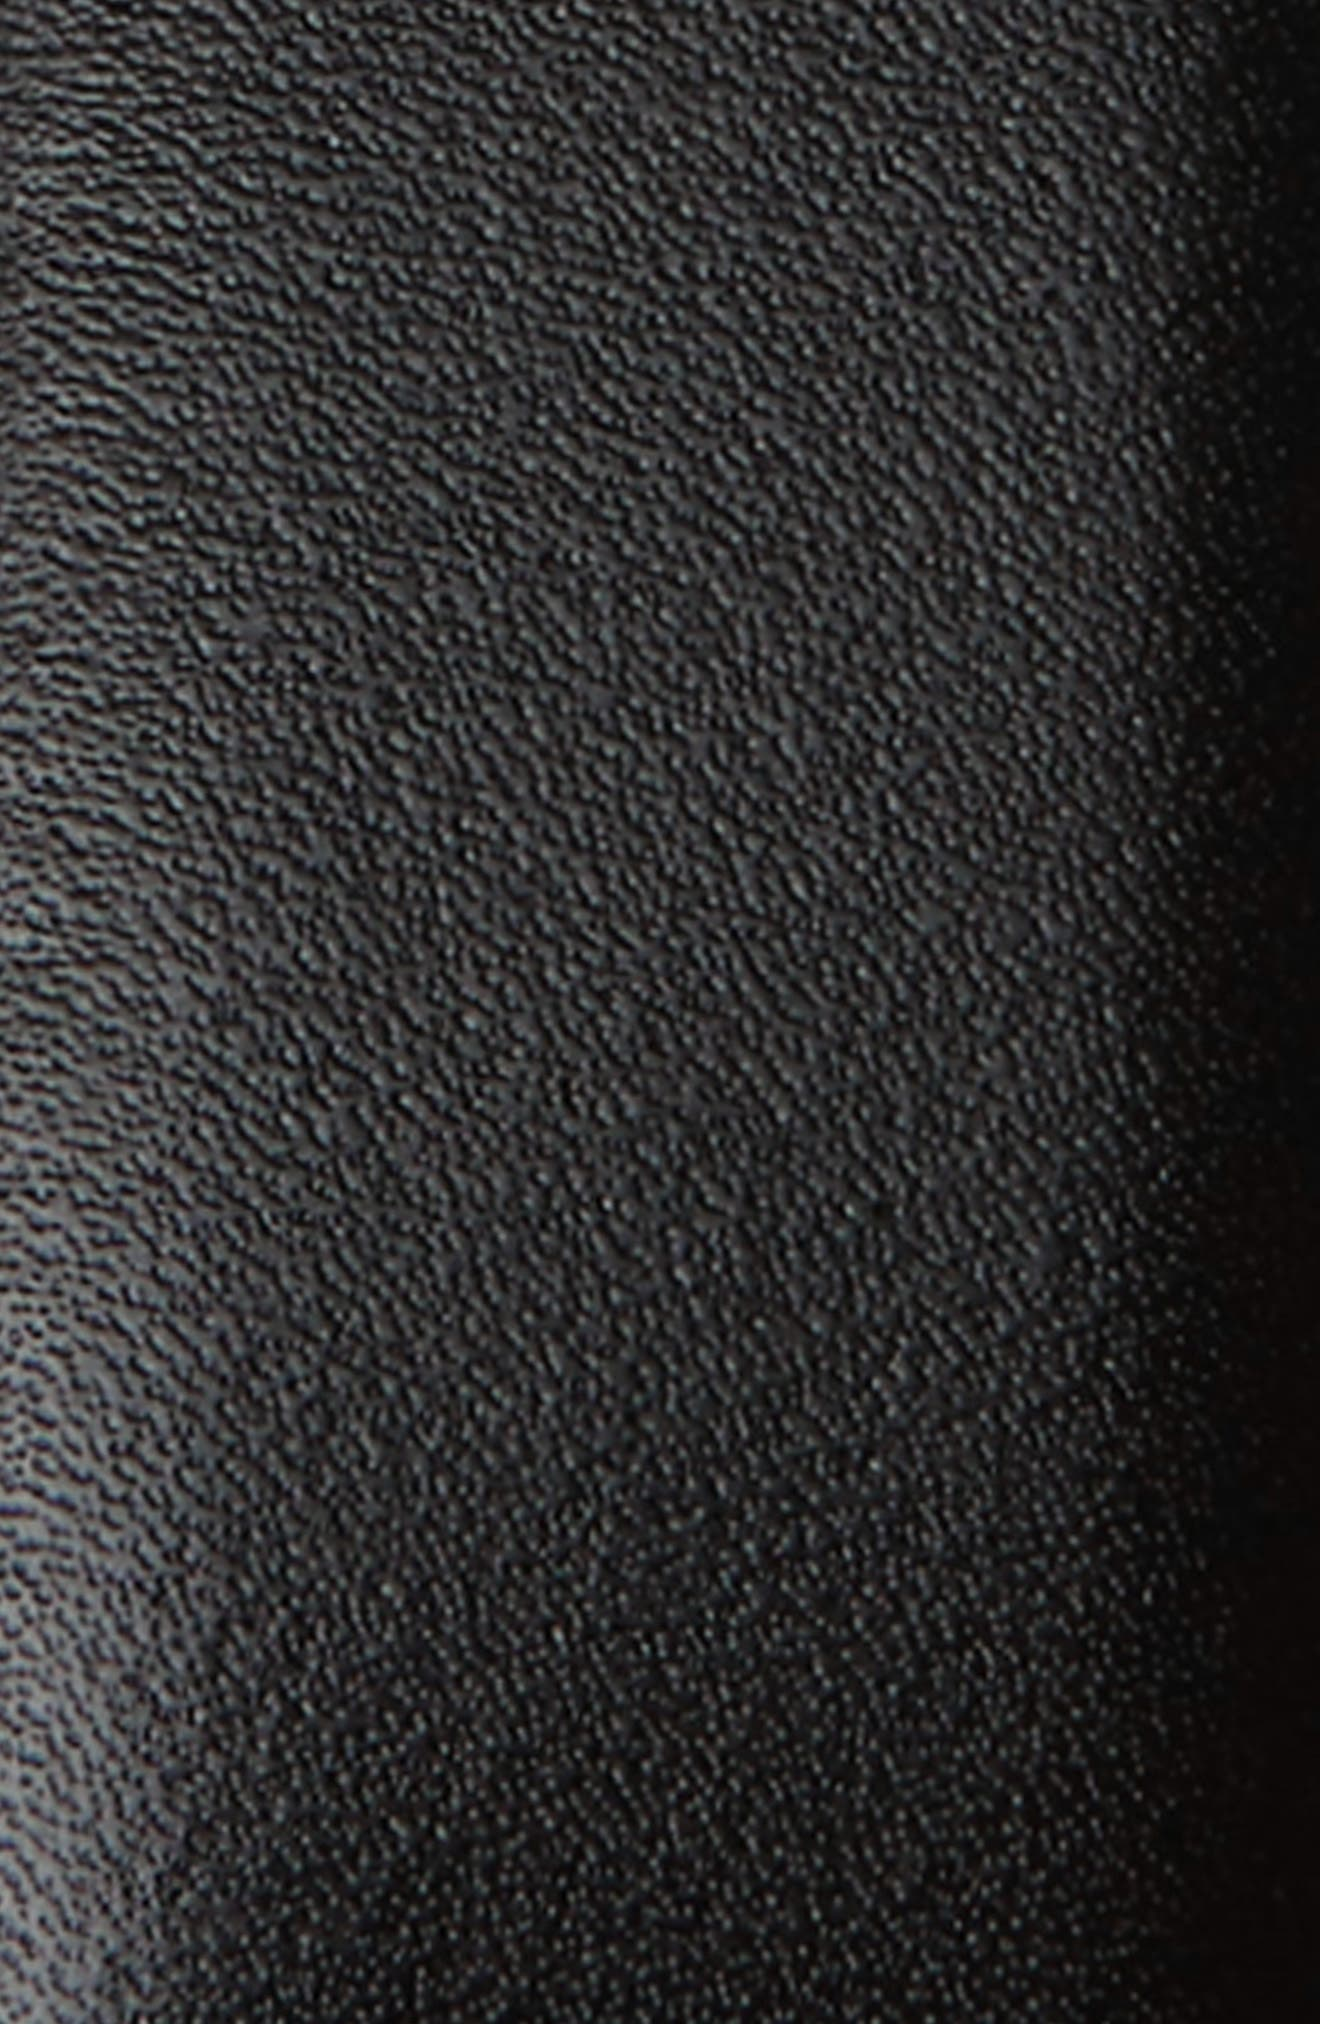 MONTBLANC, Meisterstück Buckle Reversible Leather Belt, Alternate thumbnail 3, color, BLACK/ BROWN